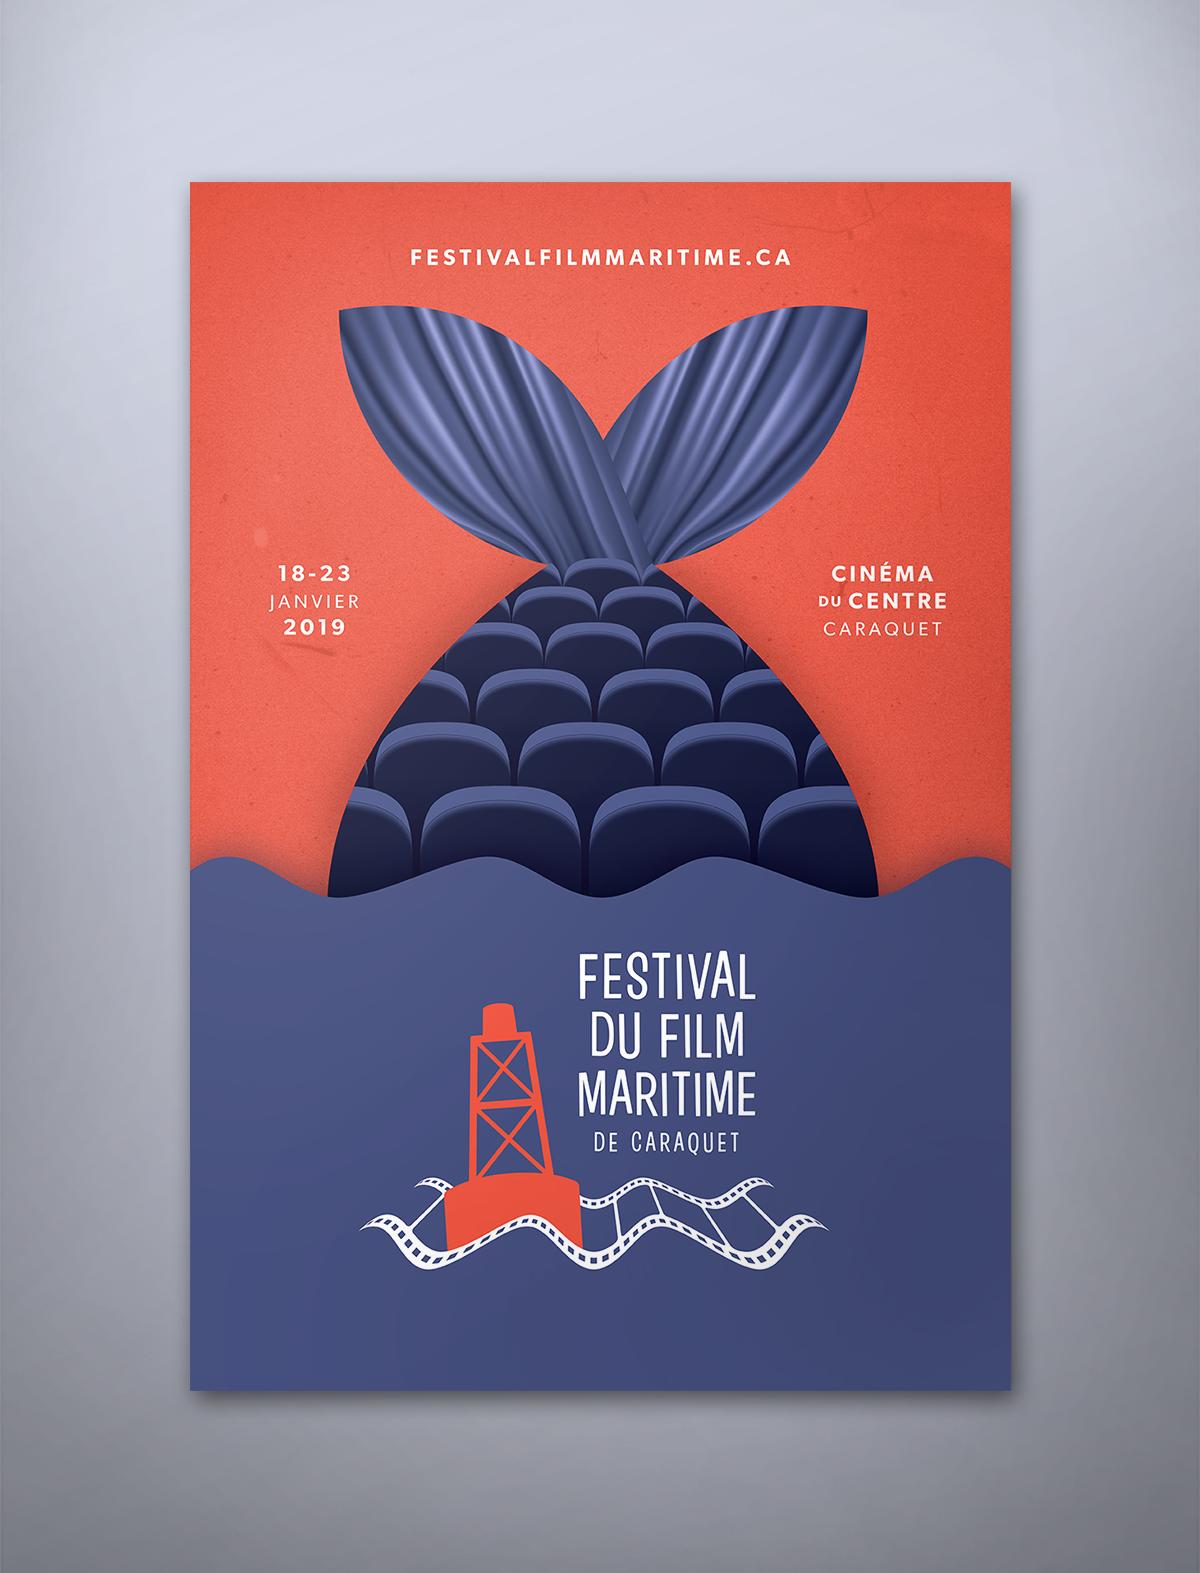 Festivalfilmmaritime-affiche.png